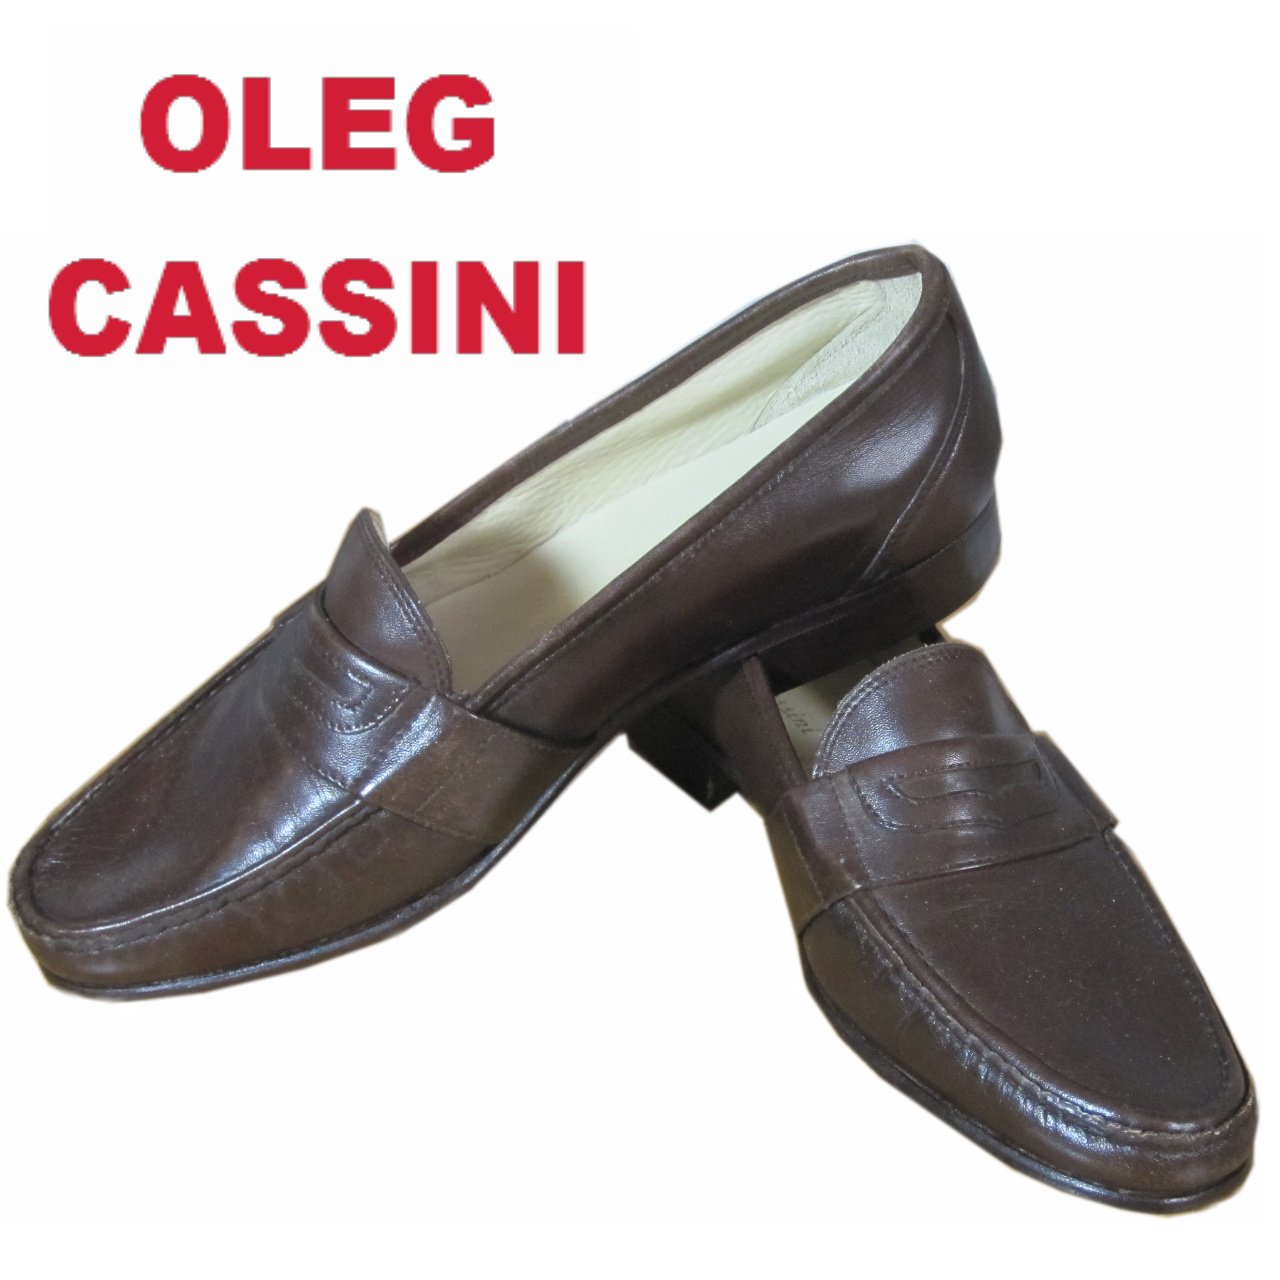 sz 9.5 OLEG CASSINI Hand Made Italian Mens Loafers $59.99 - List price $425